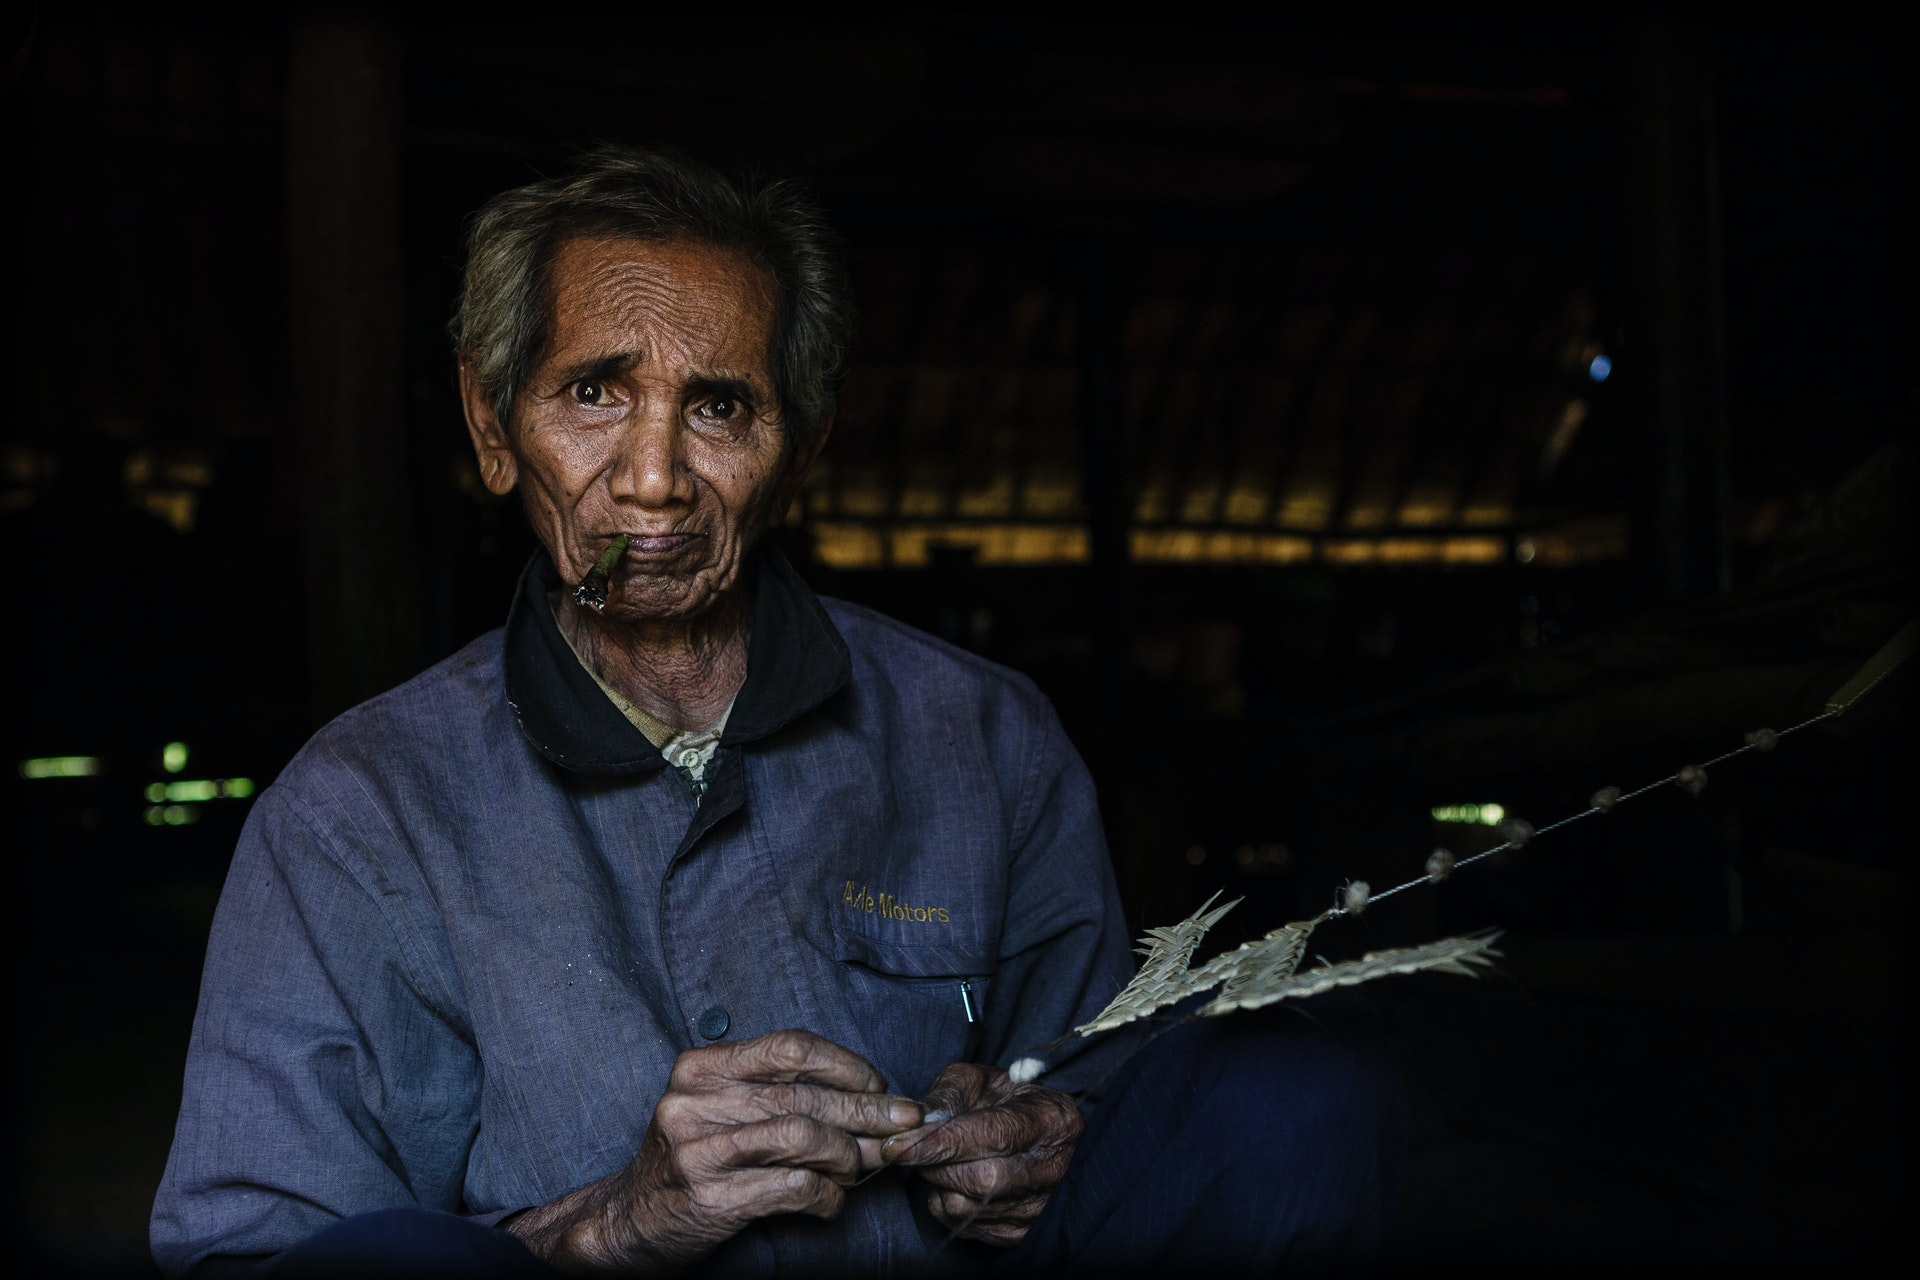 Portrait of a Bunong's man in his home in Mondulkiri, cambodia